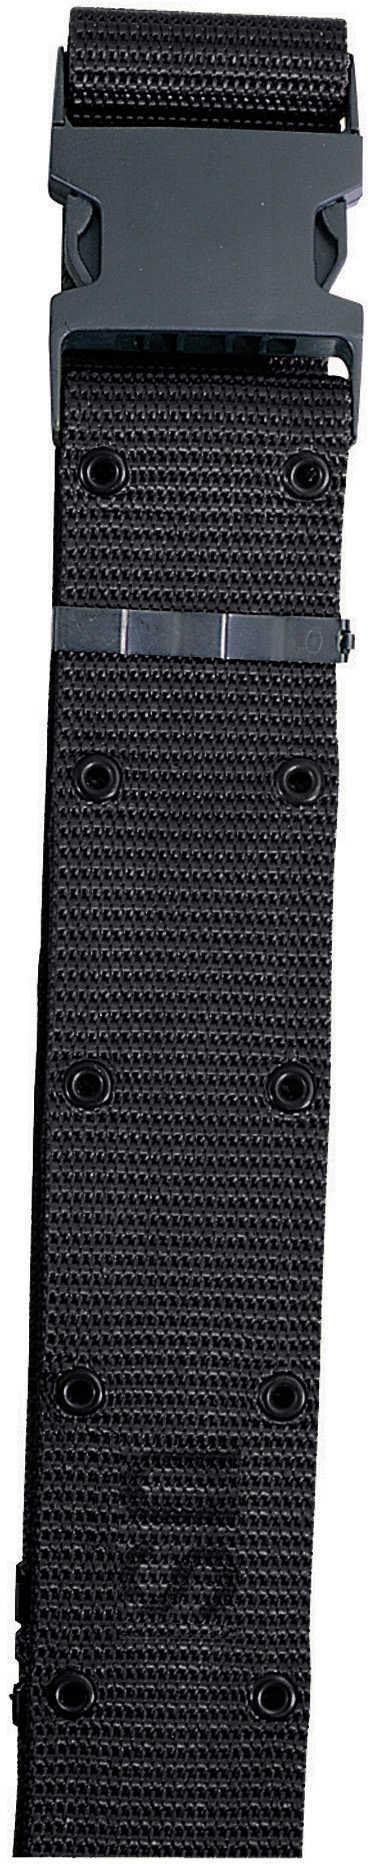 Bianchi Web Pistol Belt M1020 Black Md: 13599